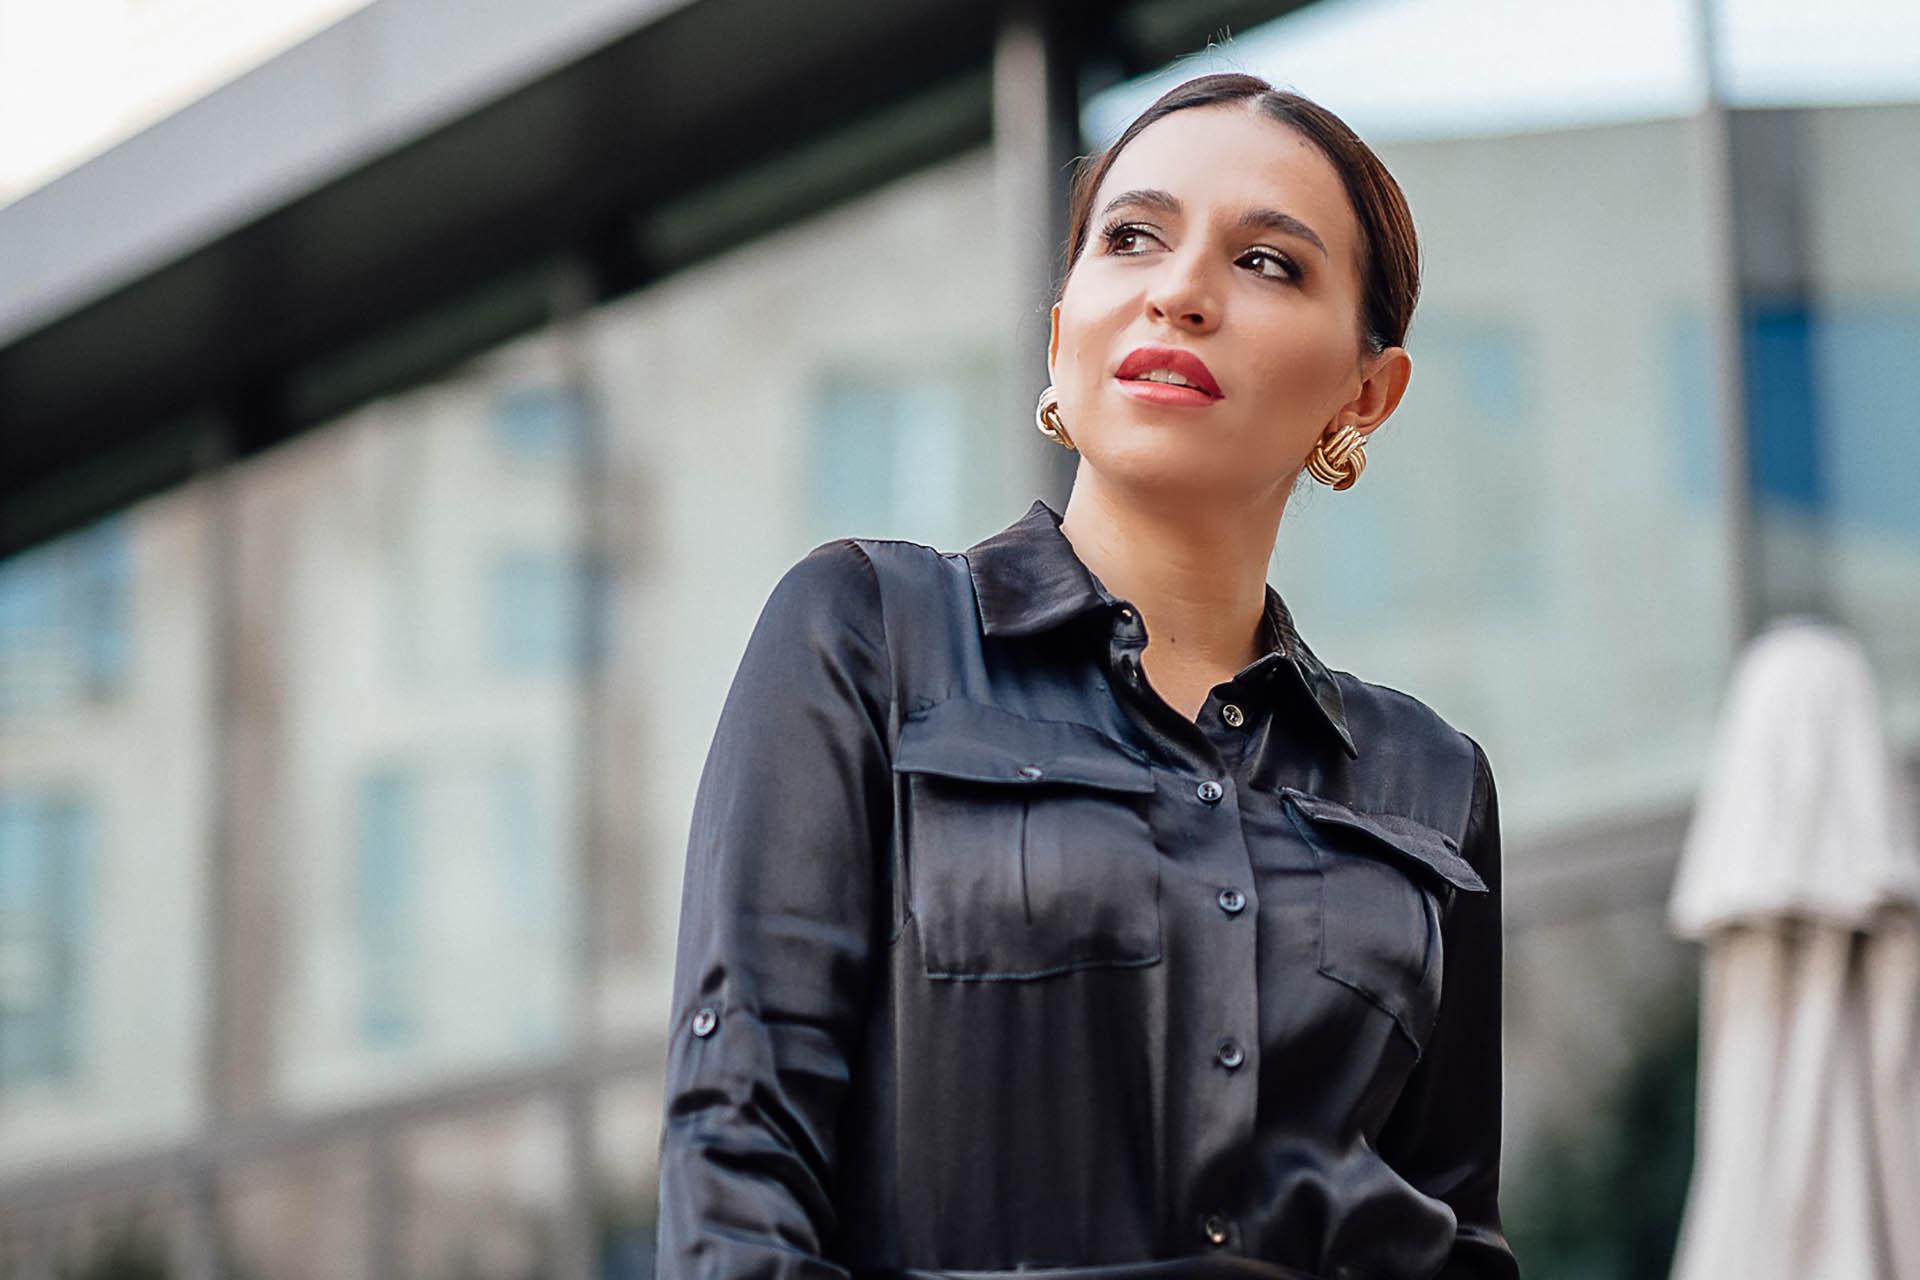 Алена Рафикова, предприниматель и бизнес-вумен